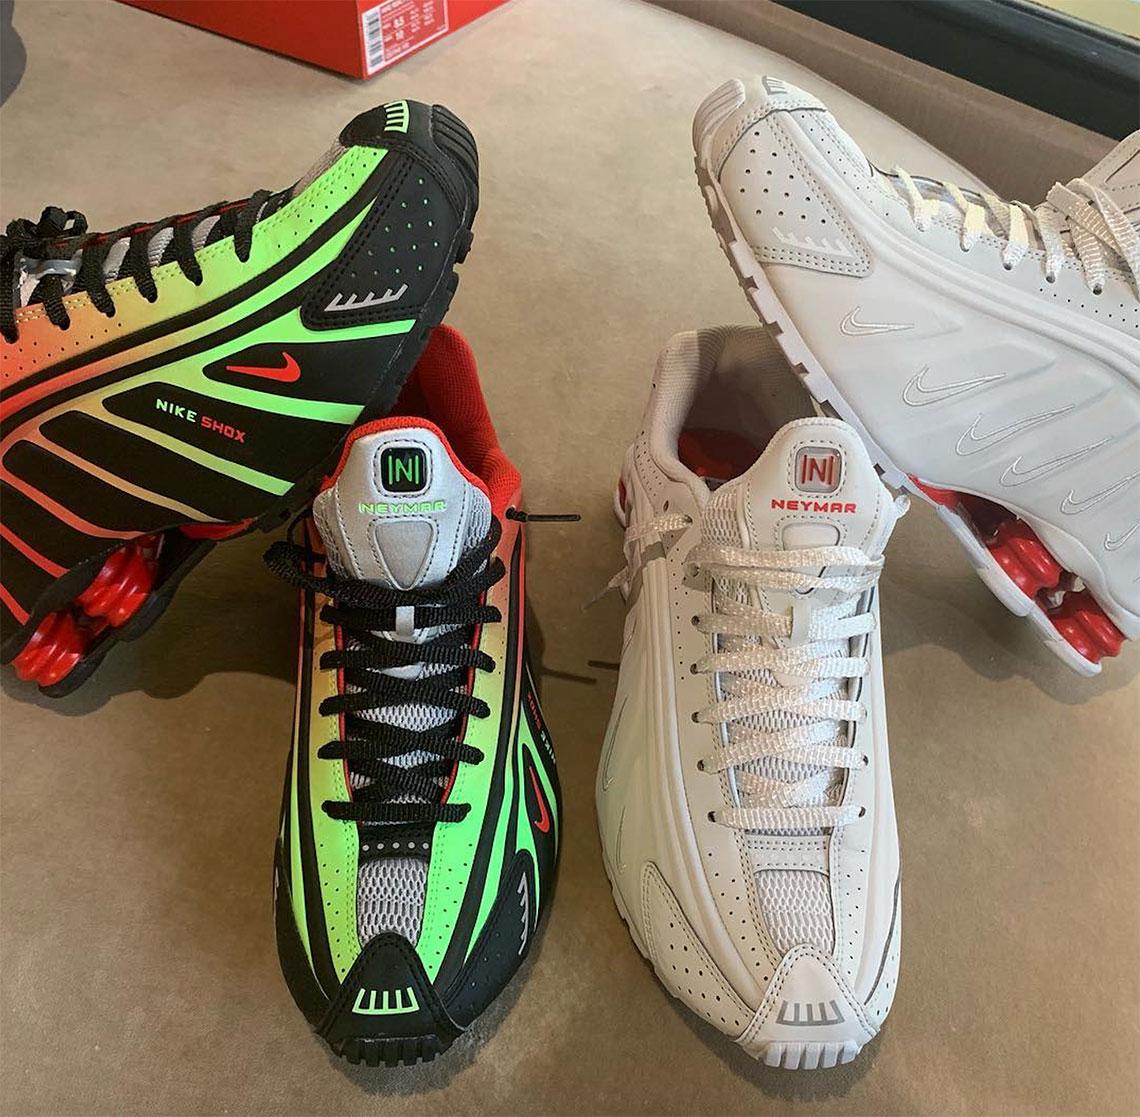 timeless design a2b96 0a896 Neymar Jr. Reveals Upcoming Nike Shox R4 Collaboration